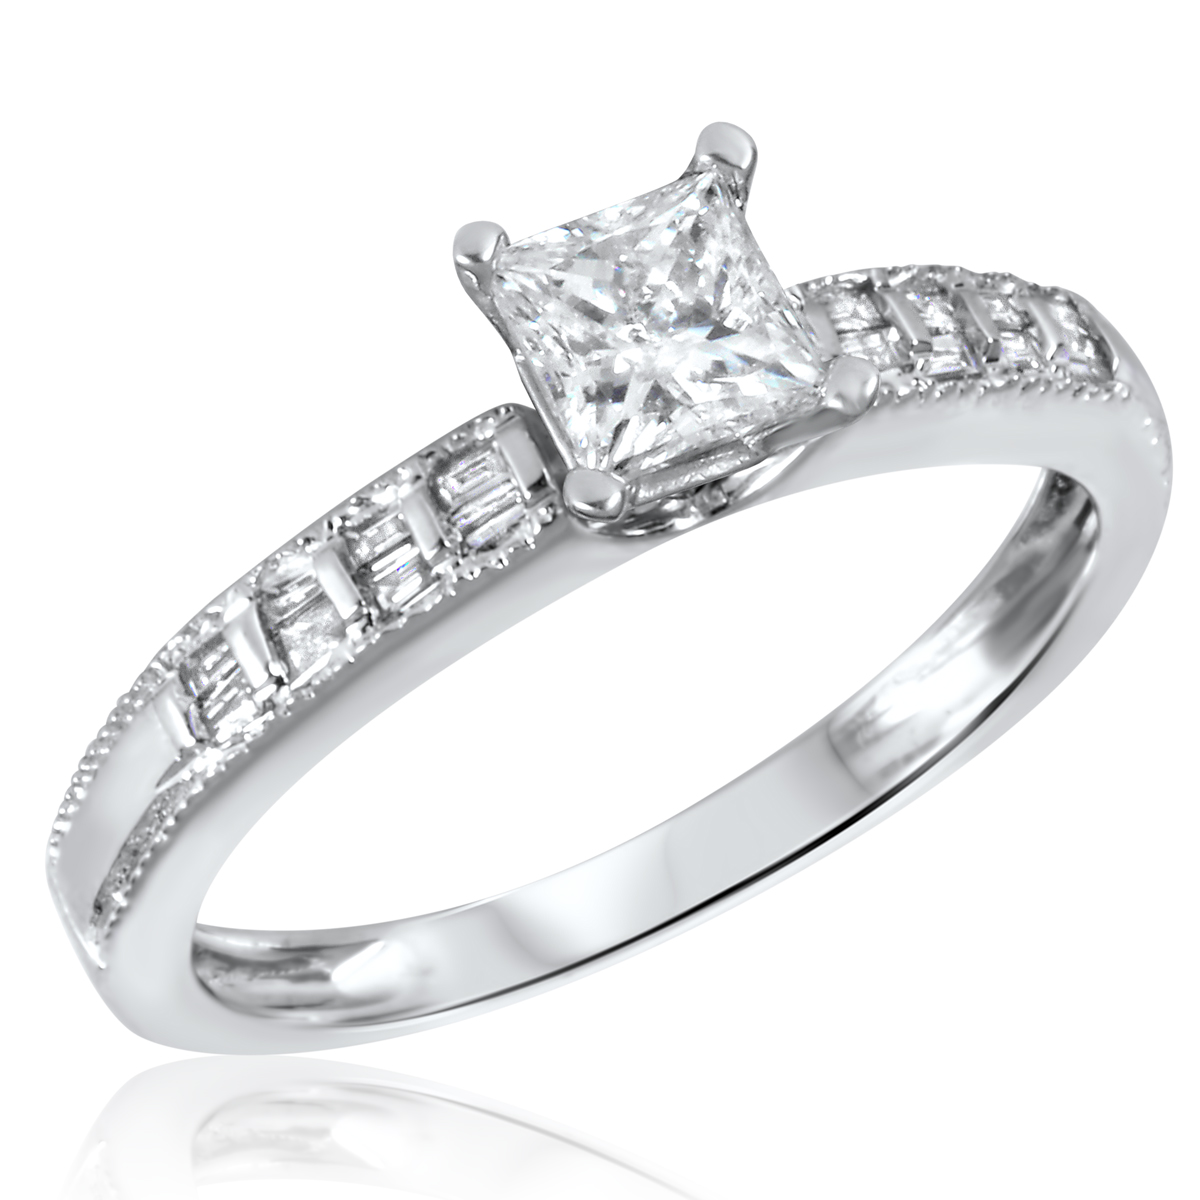 2/3 CT. T.W. Diamond Ladies Engagement Ring 10K White Gold- Size 8